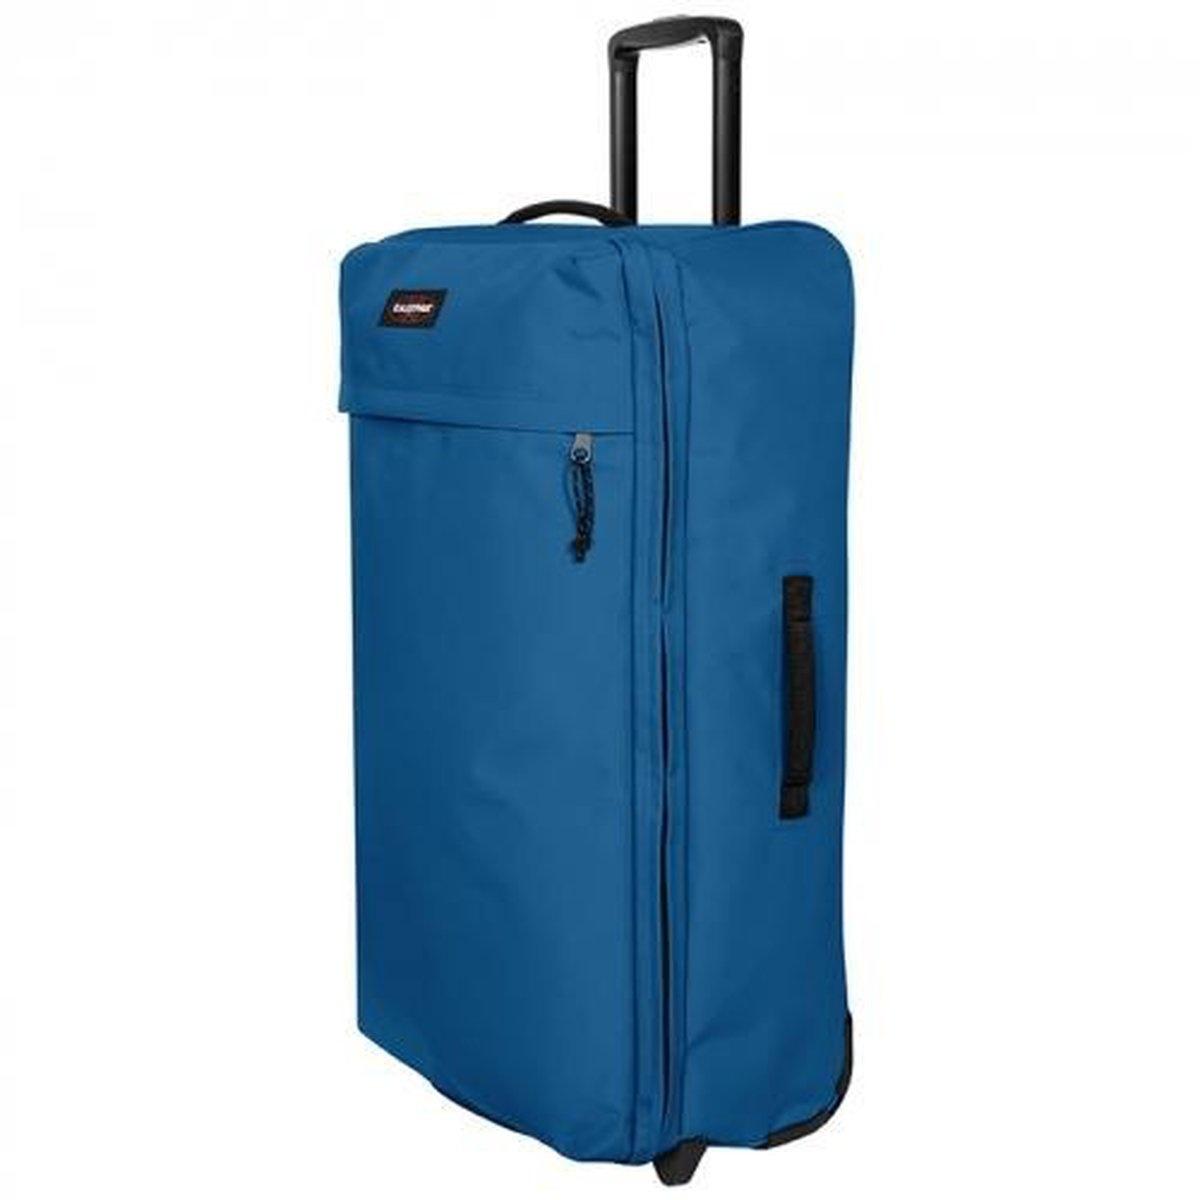 Eastpak Eastpak Traf'ik Light L - Grote maat reistrolley - Urban Blue